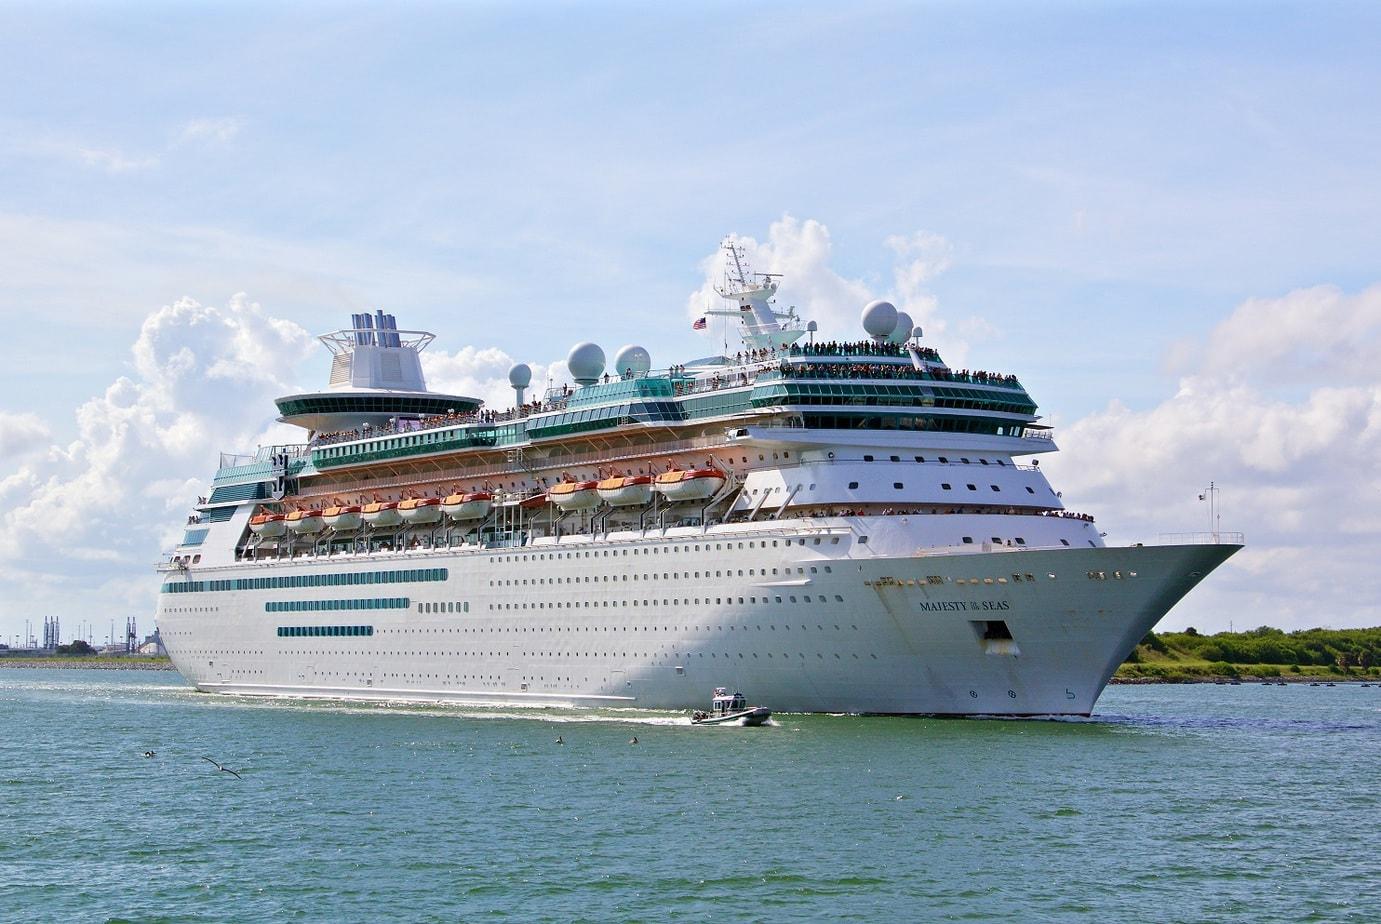 Majesty of the Seas